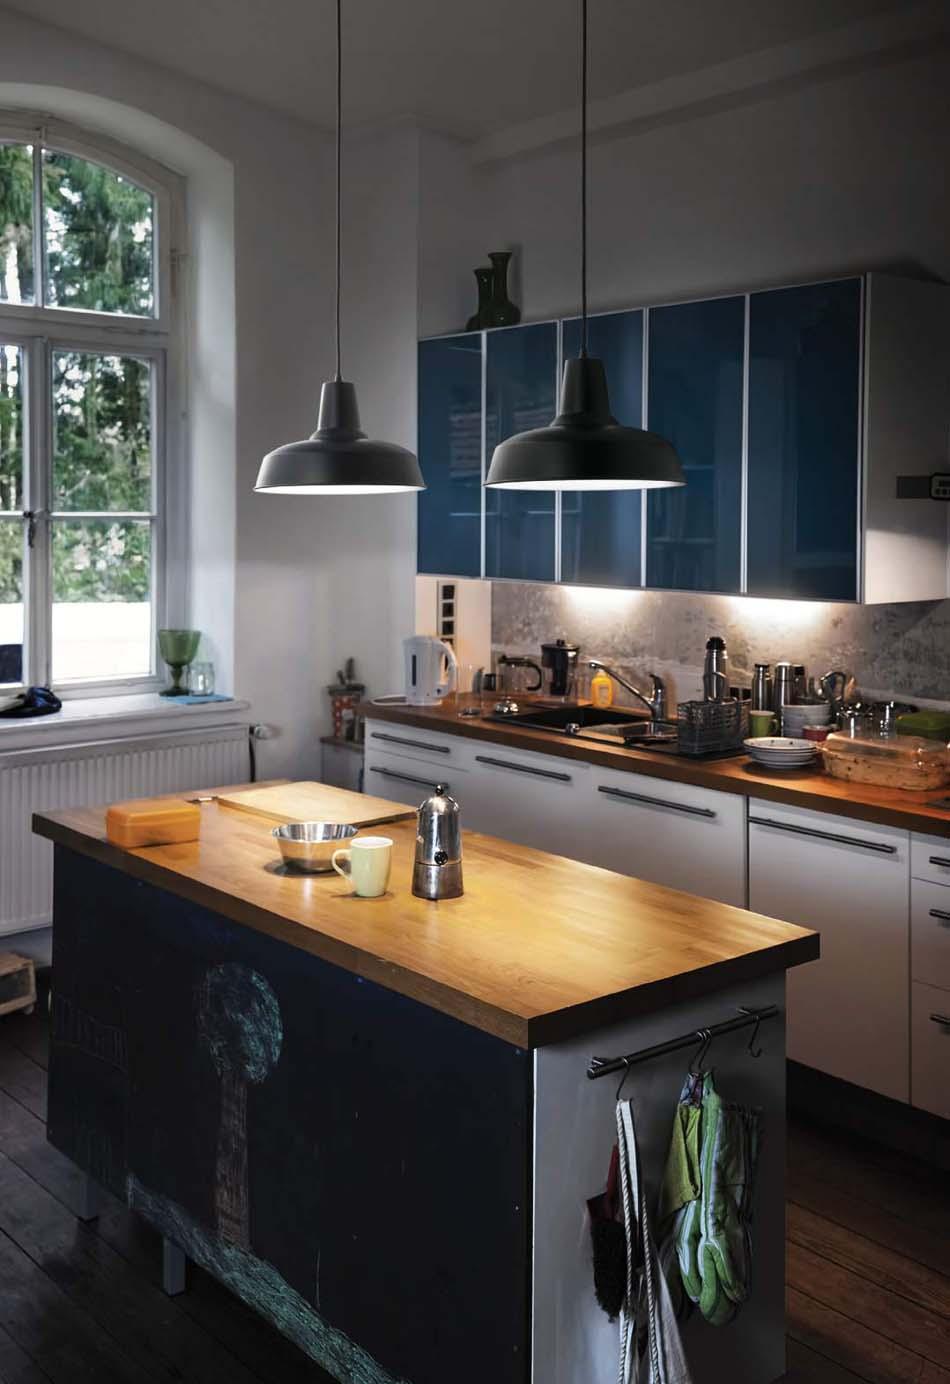 Lampade sospensione Ideal Lux Moby – Bruni Arredamenti